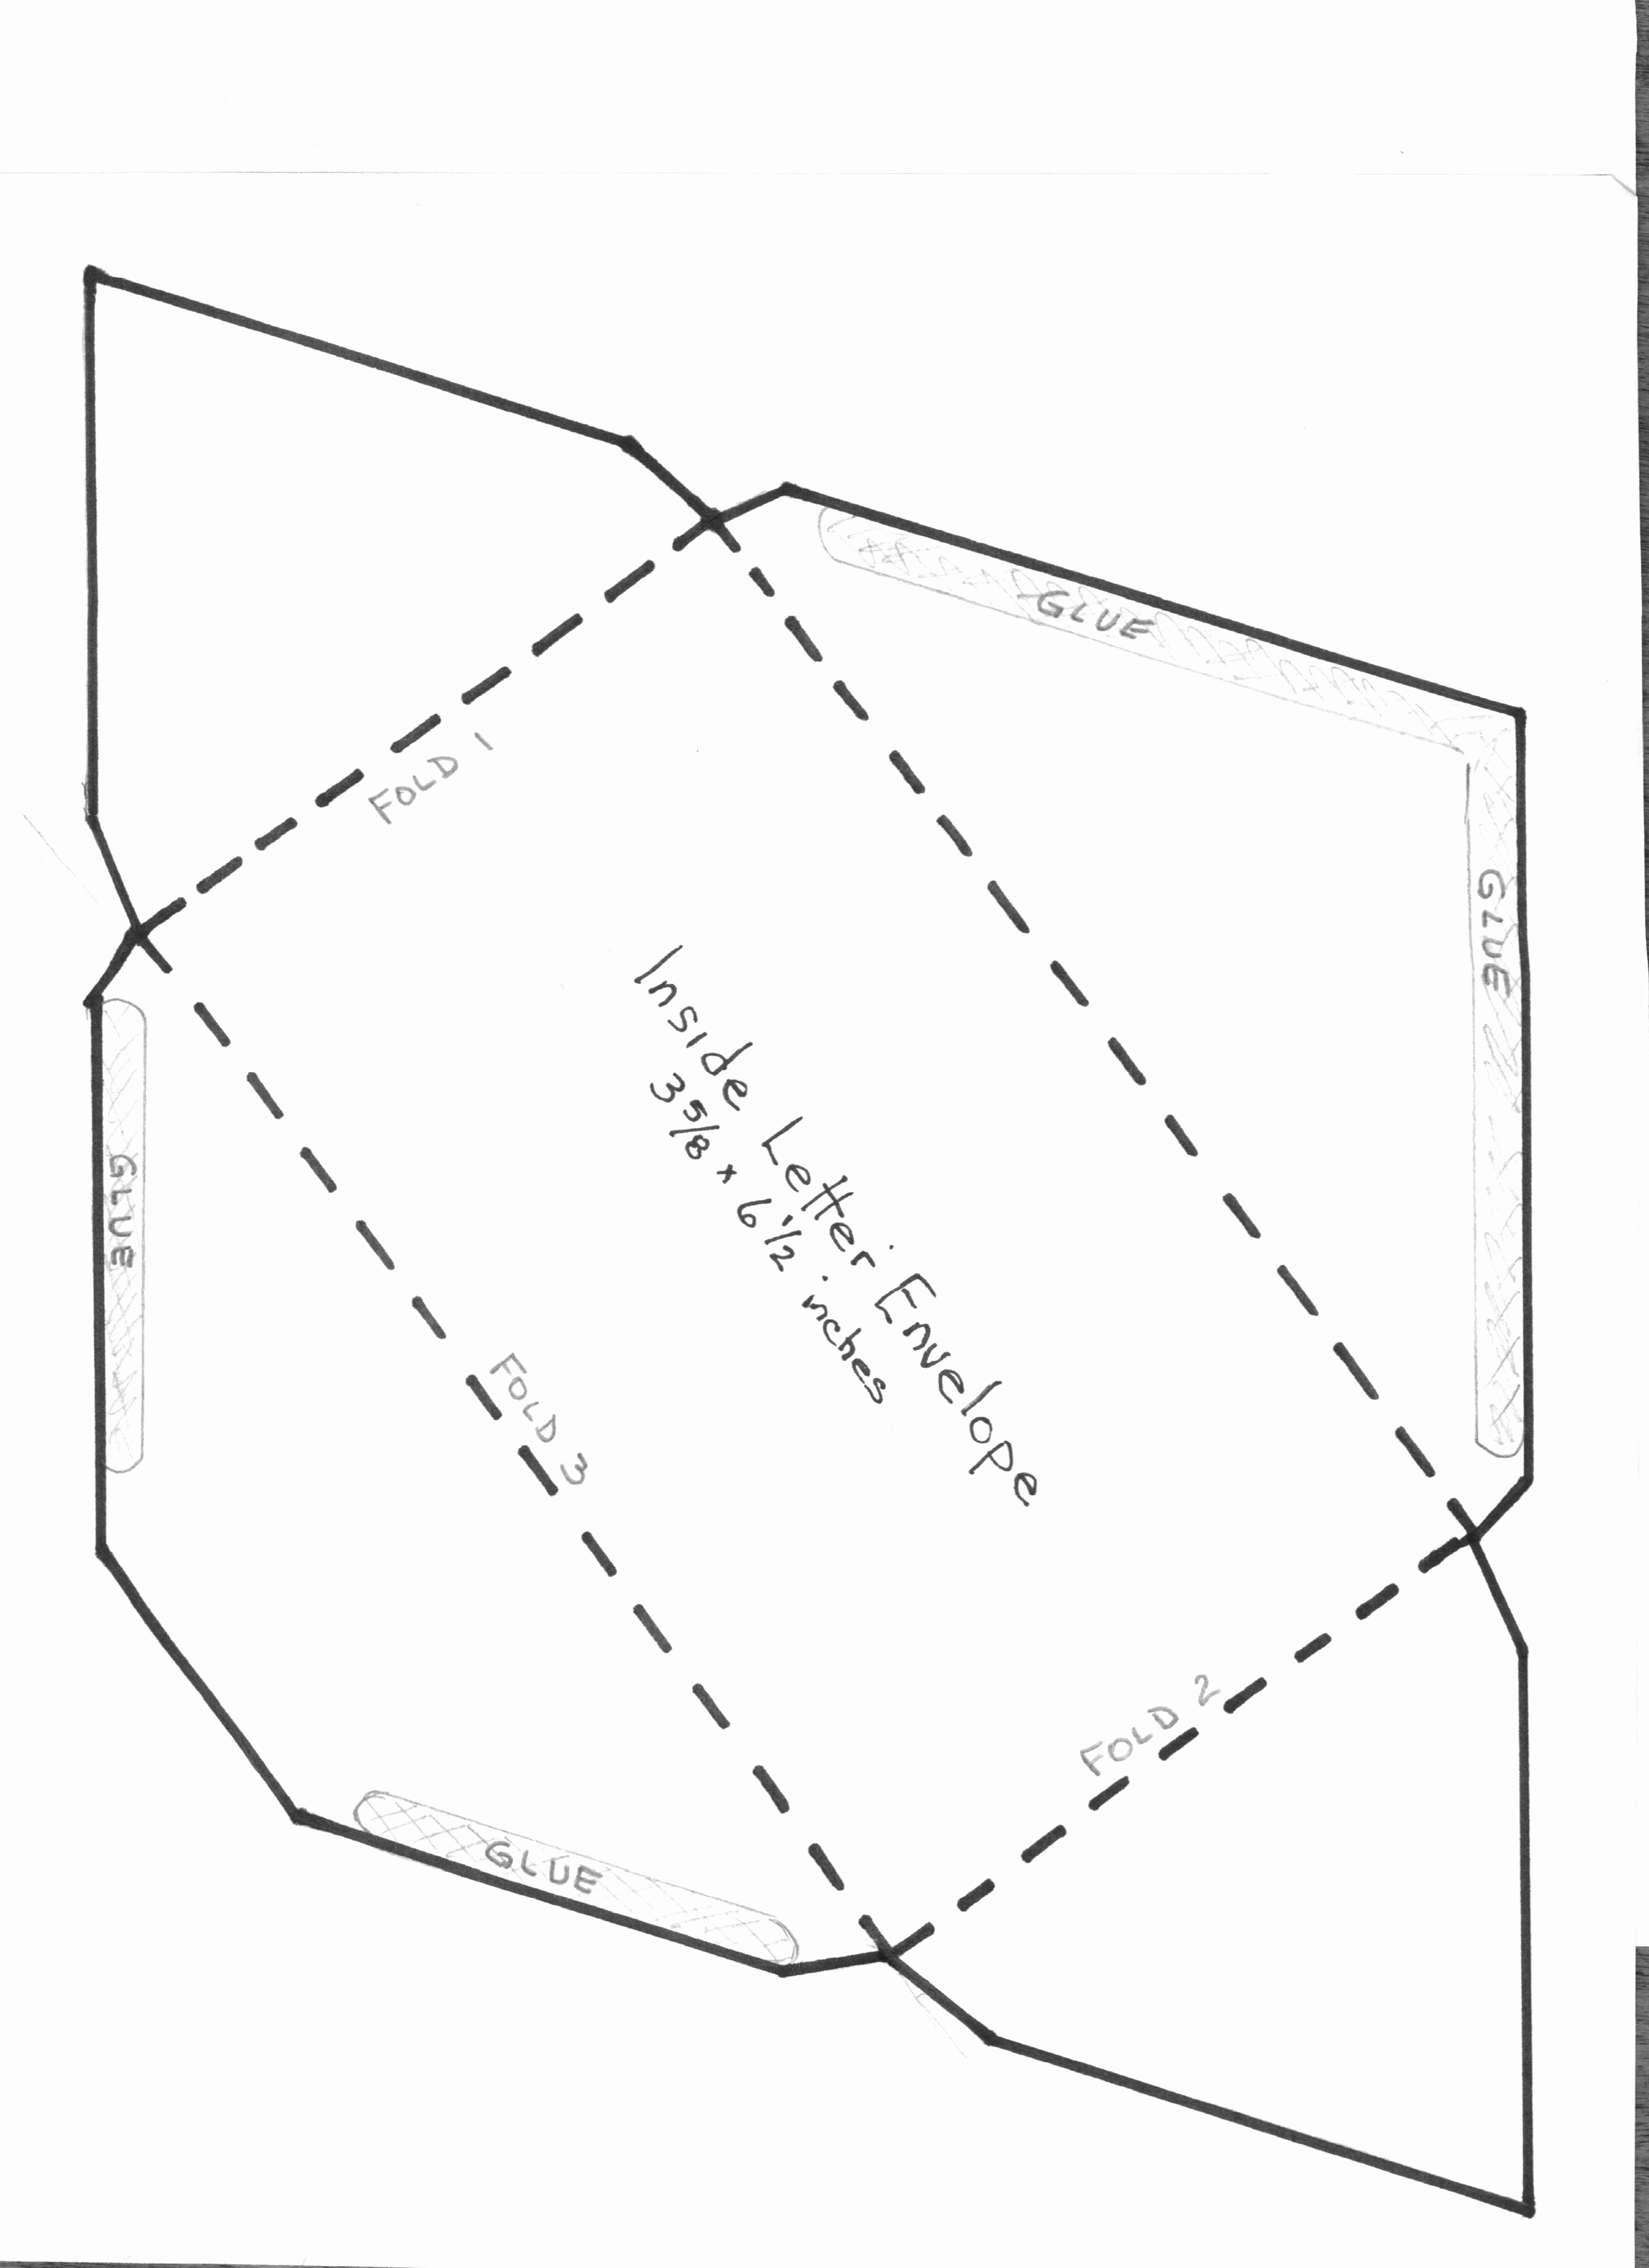 Printable Envelope Template Pdf Beautiful 10 Best Of Envelope Template Free Printable